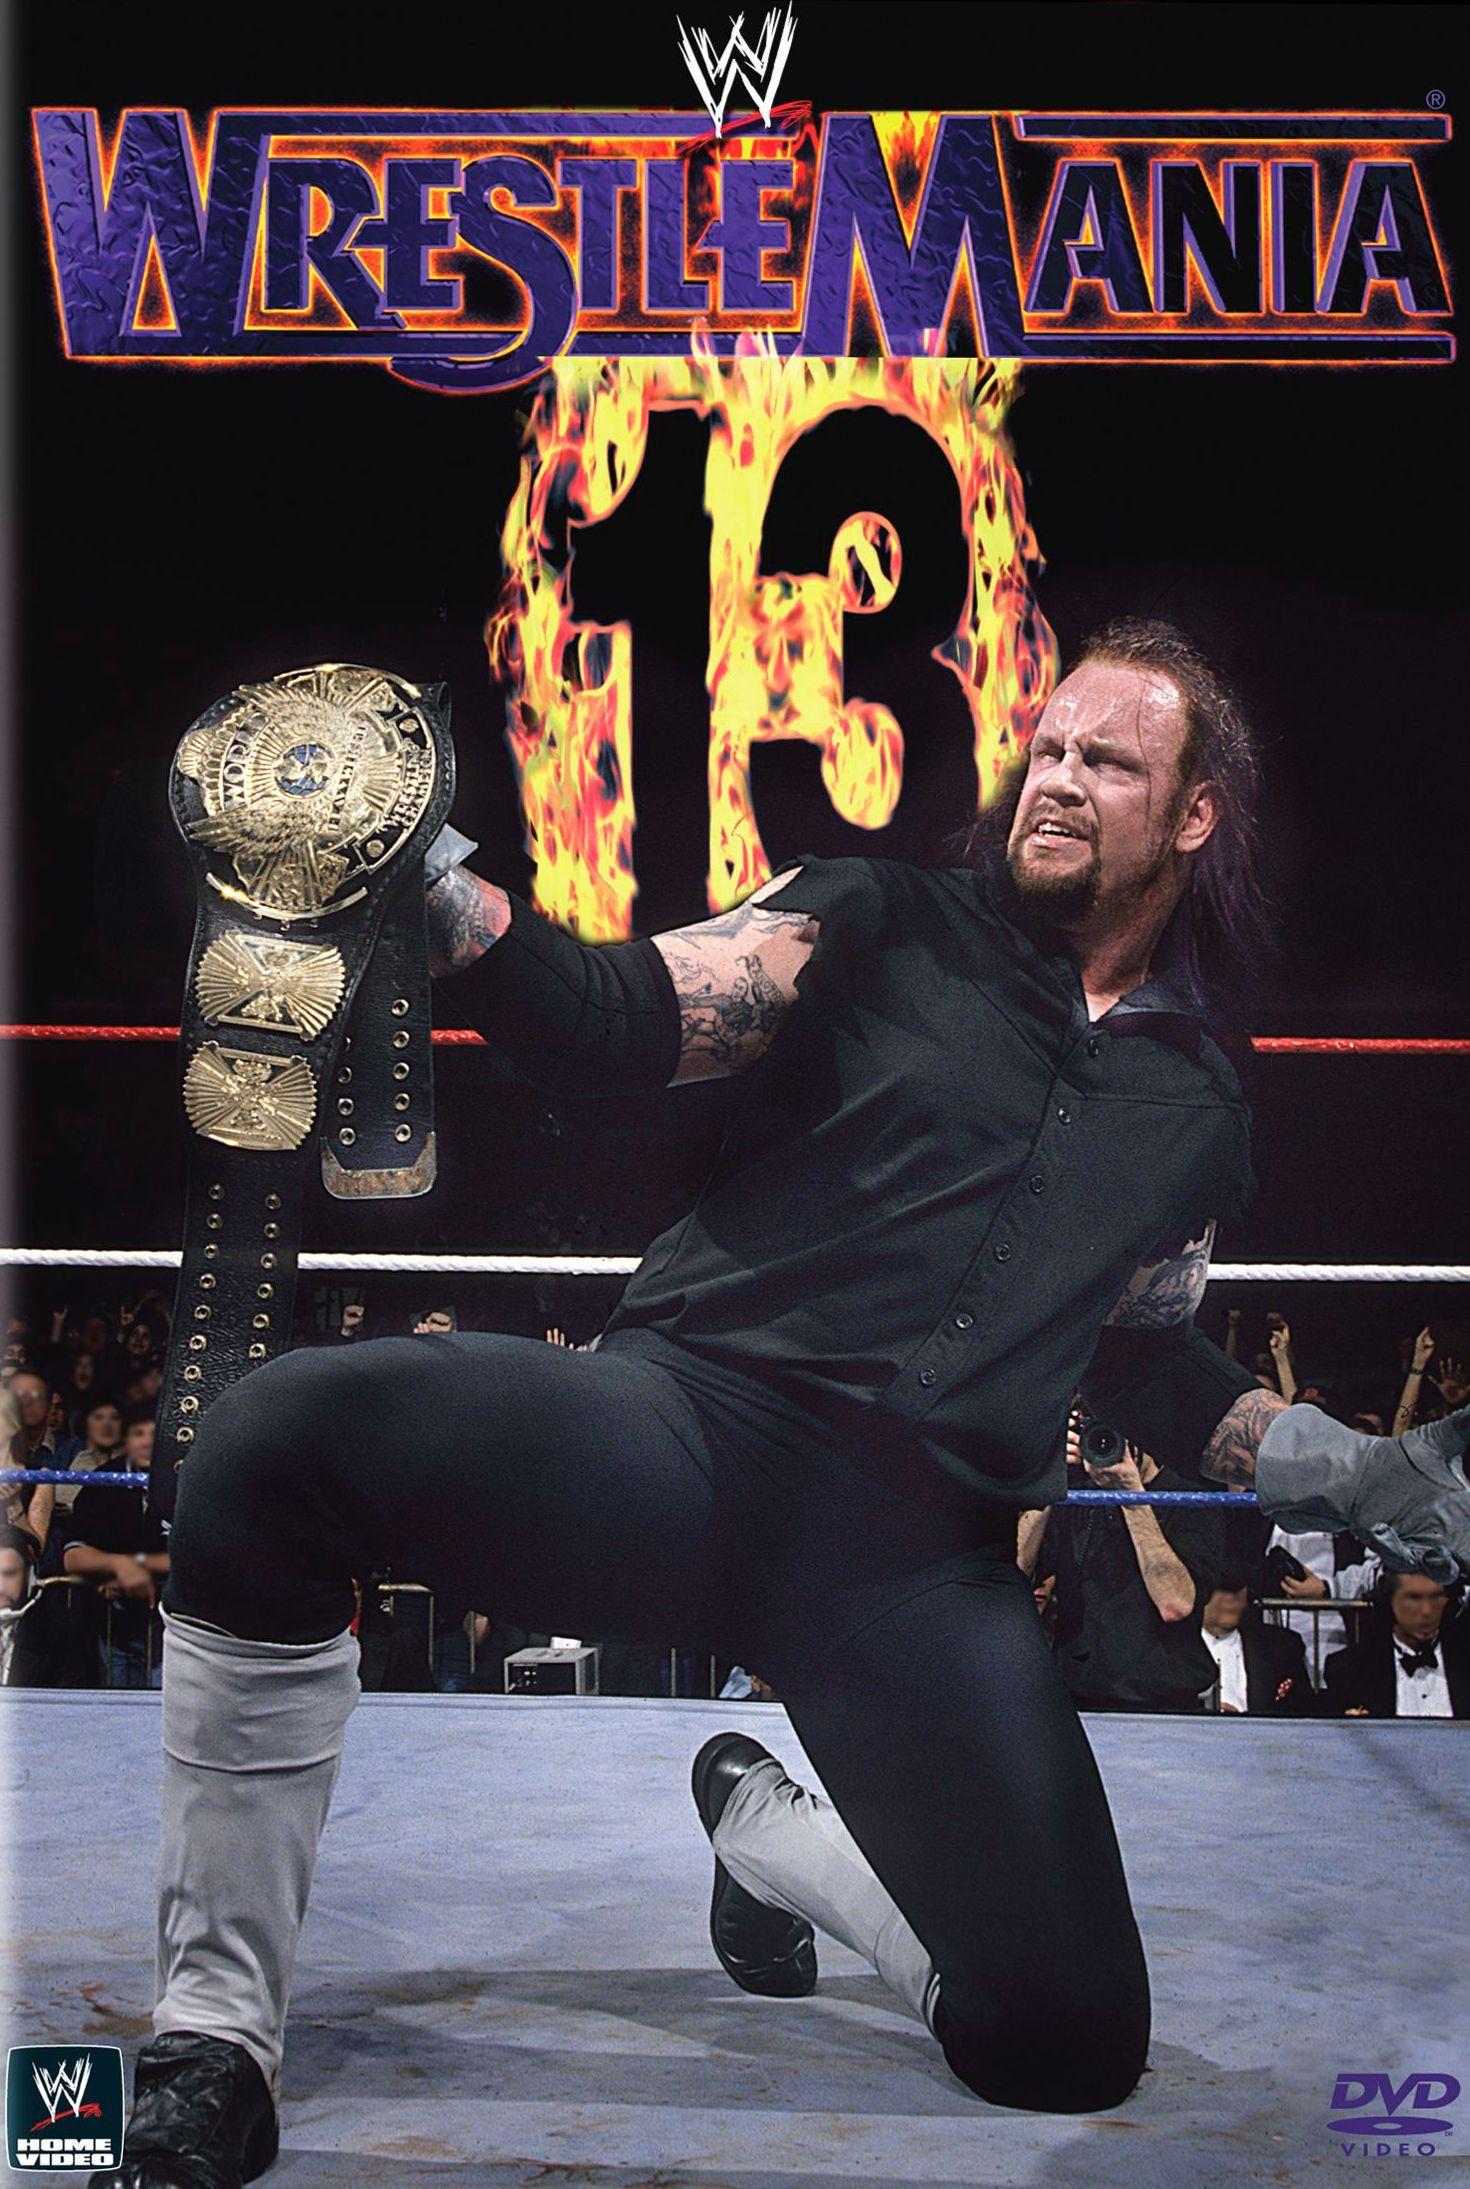 WWE: Wrestlemania XIII